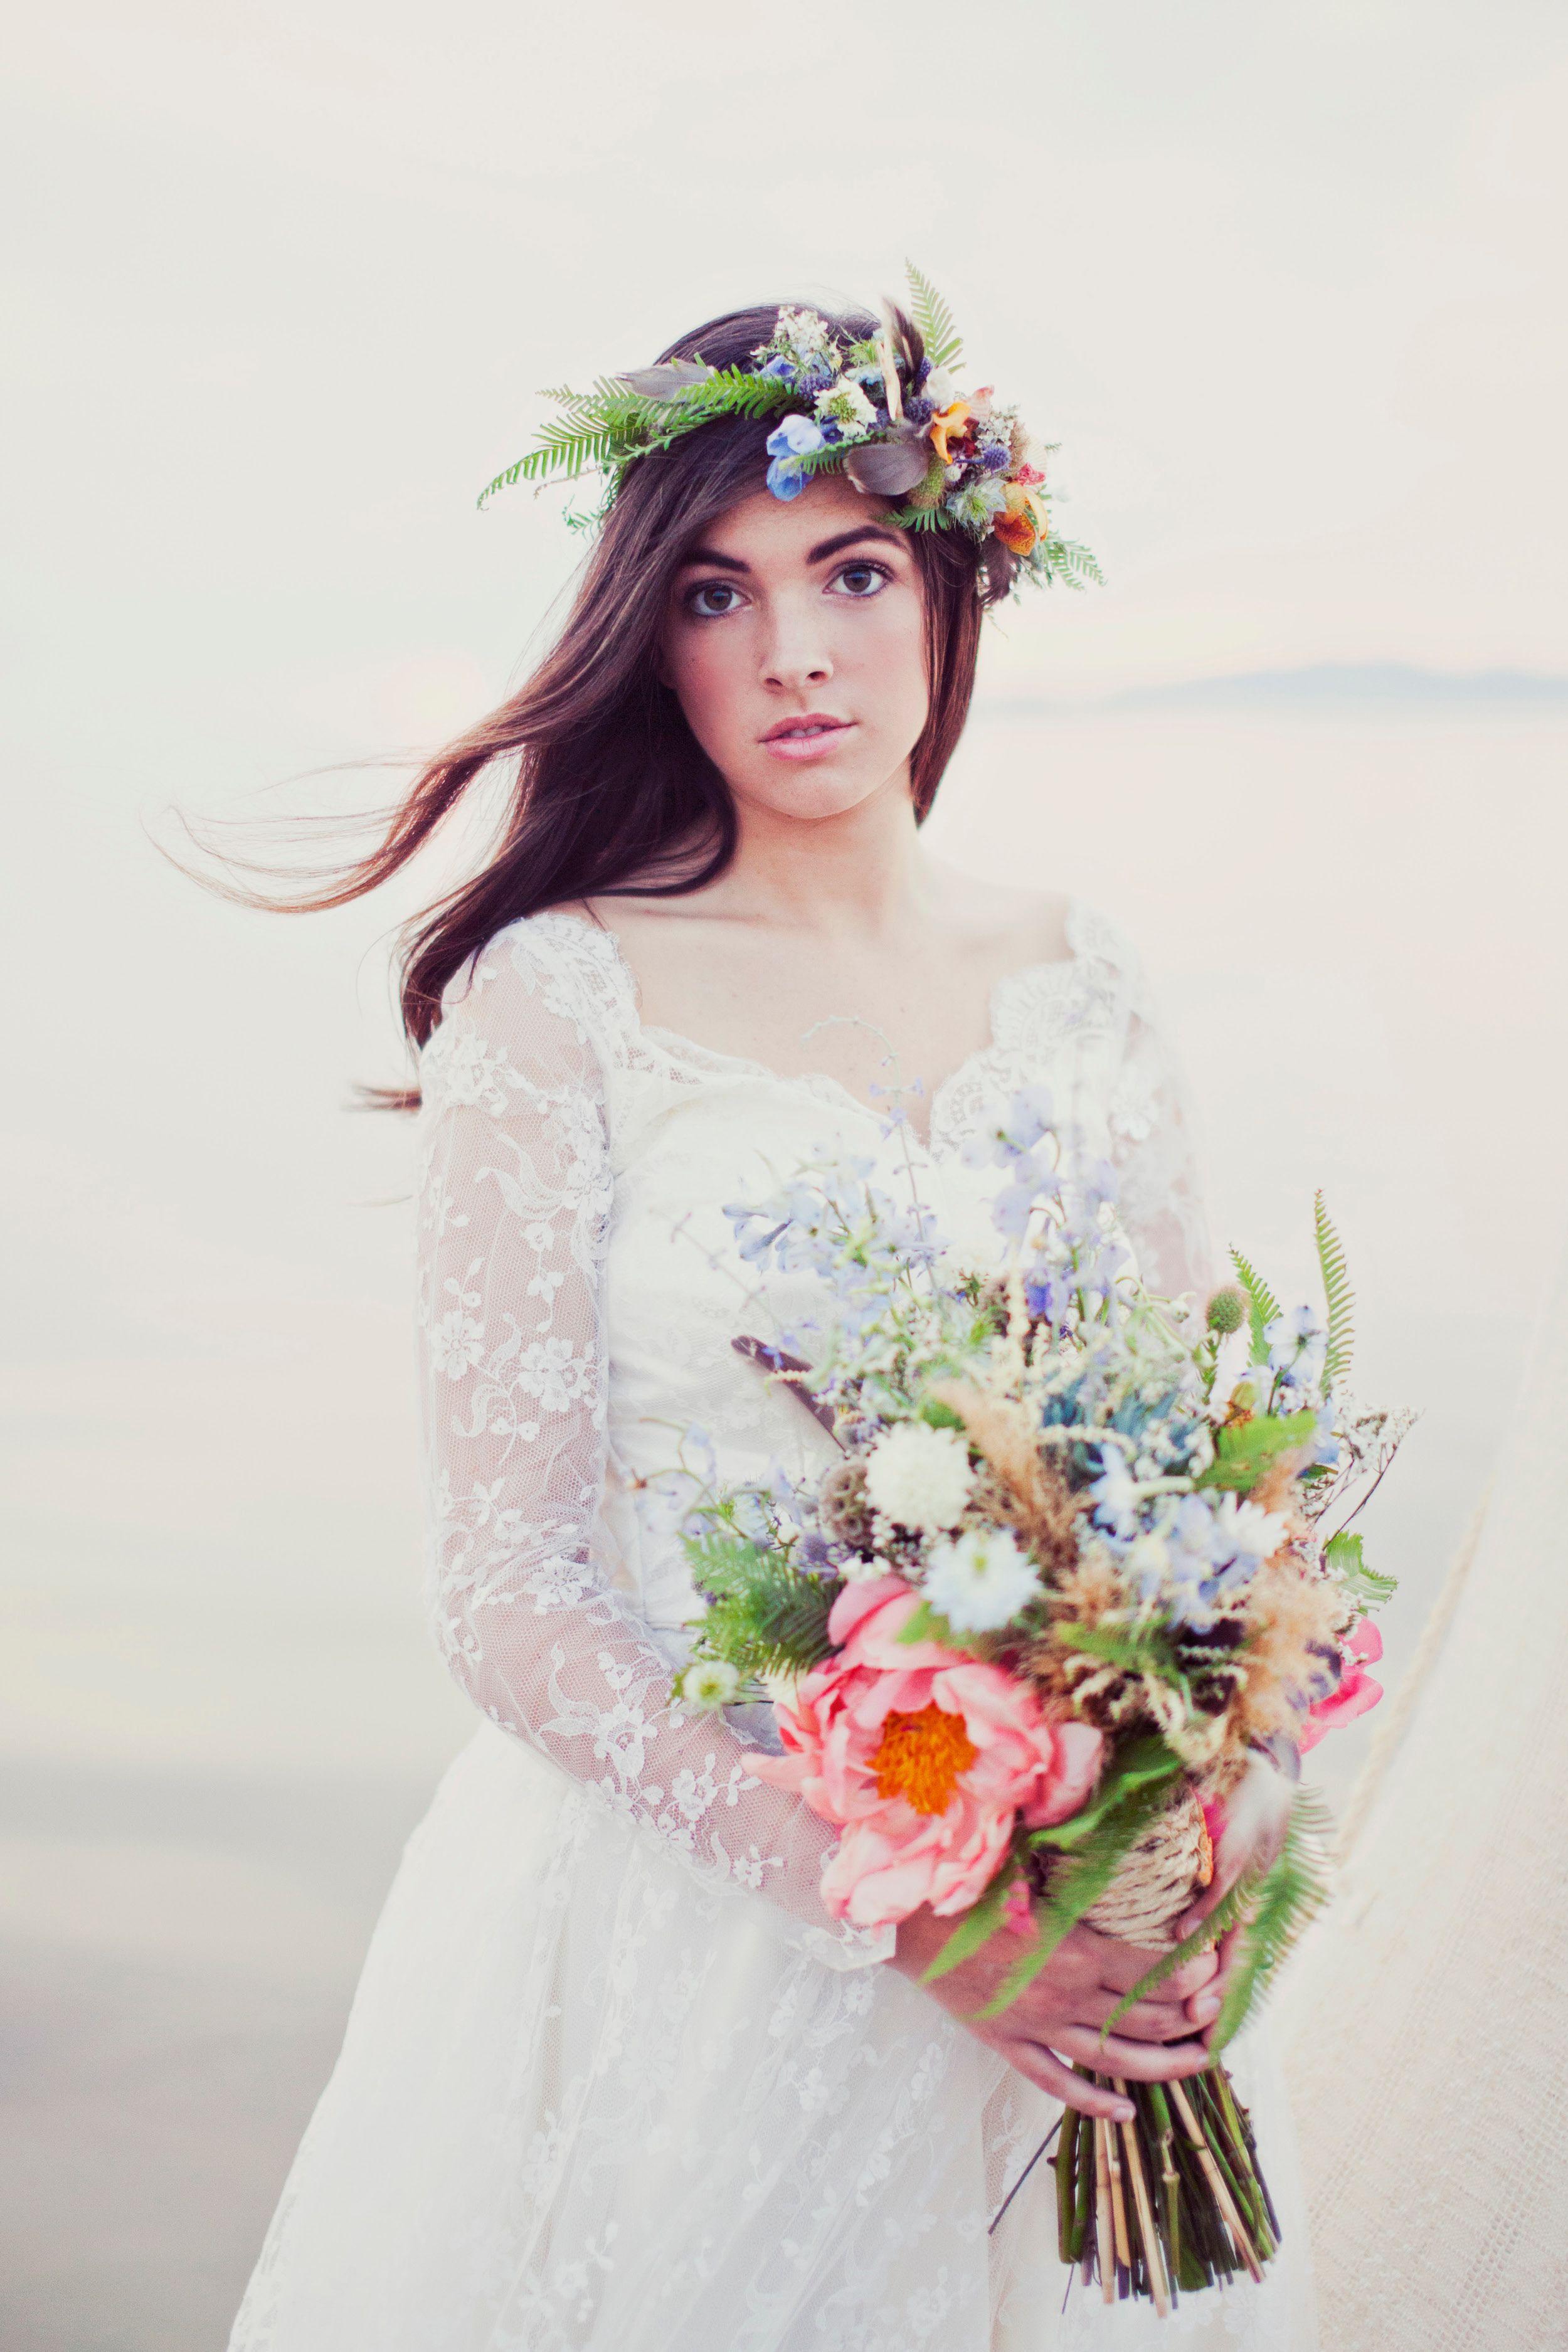 Castaway Bridal Shoot by Stephanie Sunderland | Weddings that I love ...